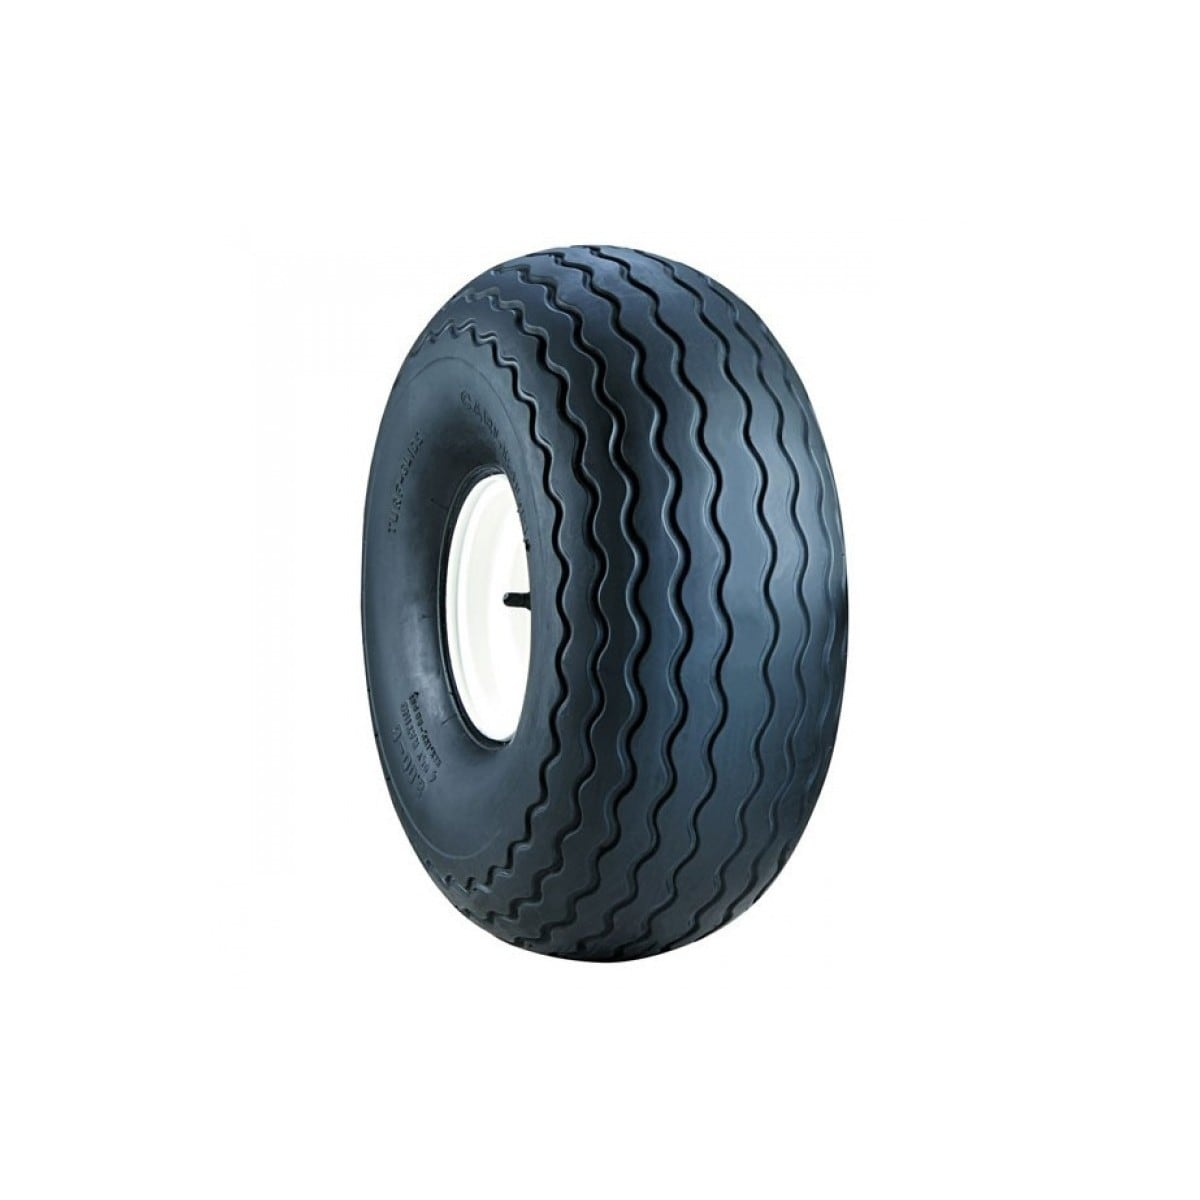 Carlisle Rib Lawn & Garden Tire - 800-6 LRB/4 ply (Black)...